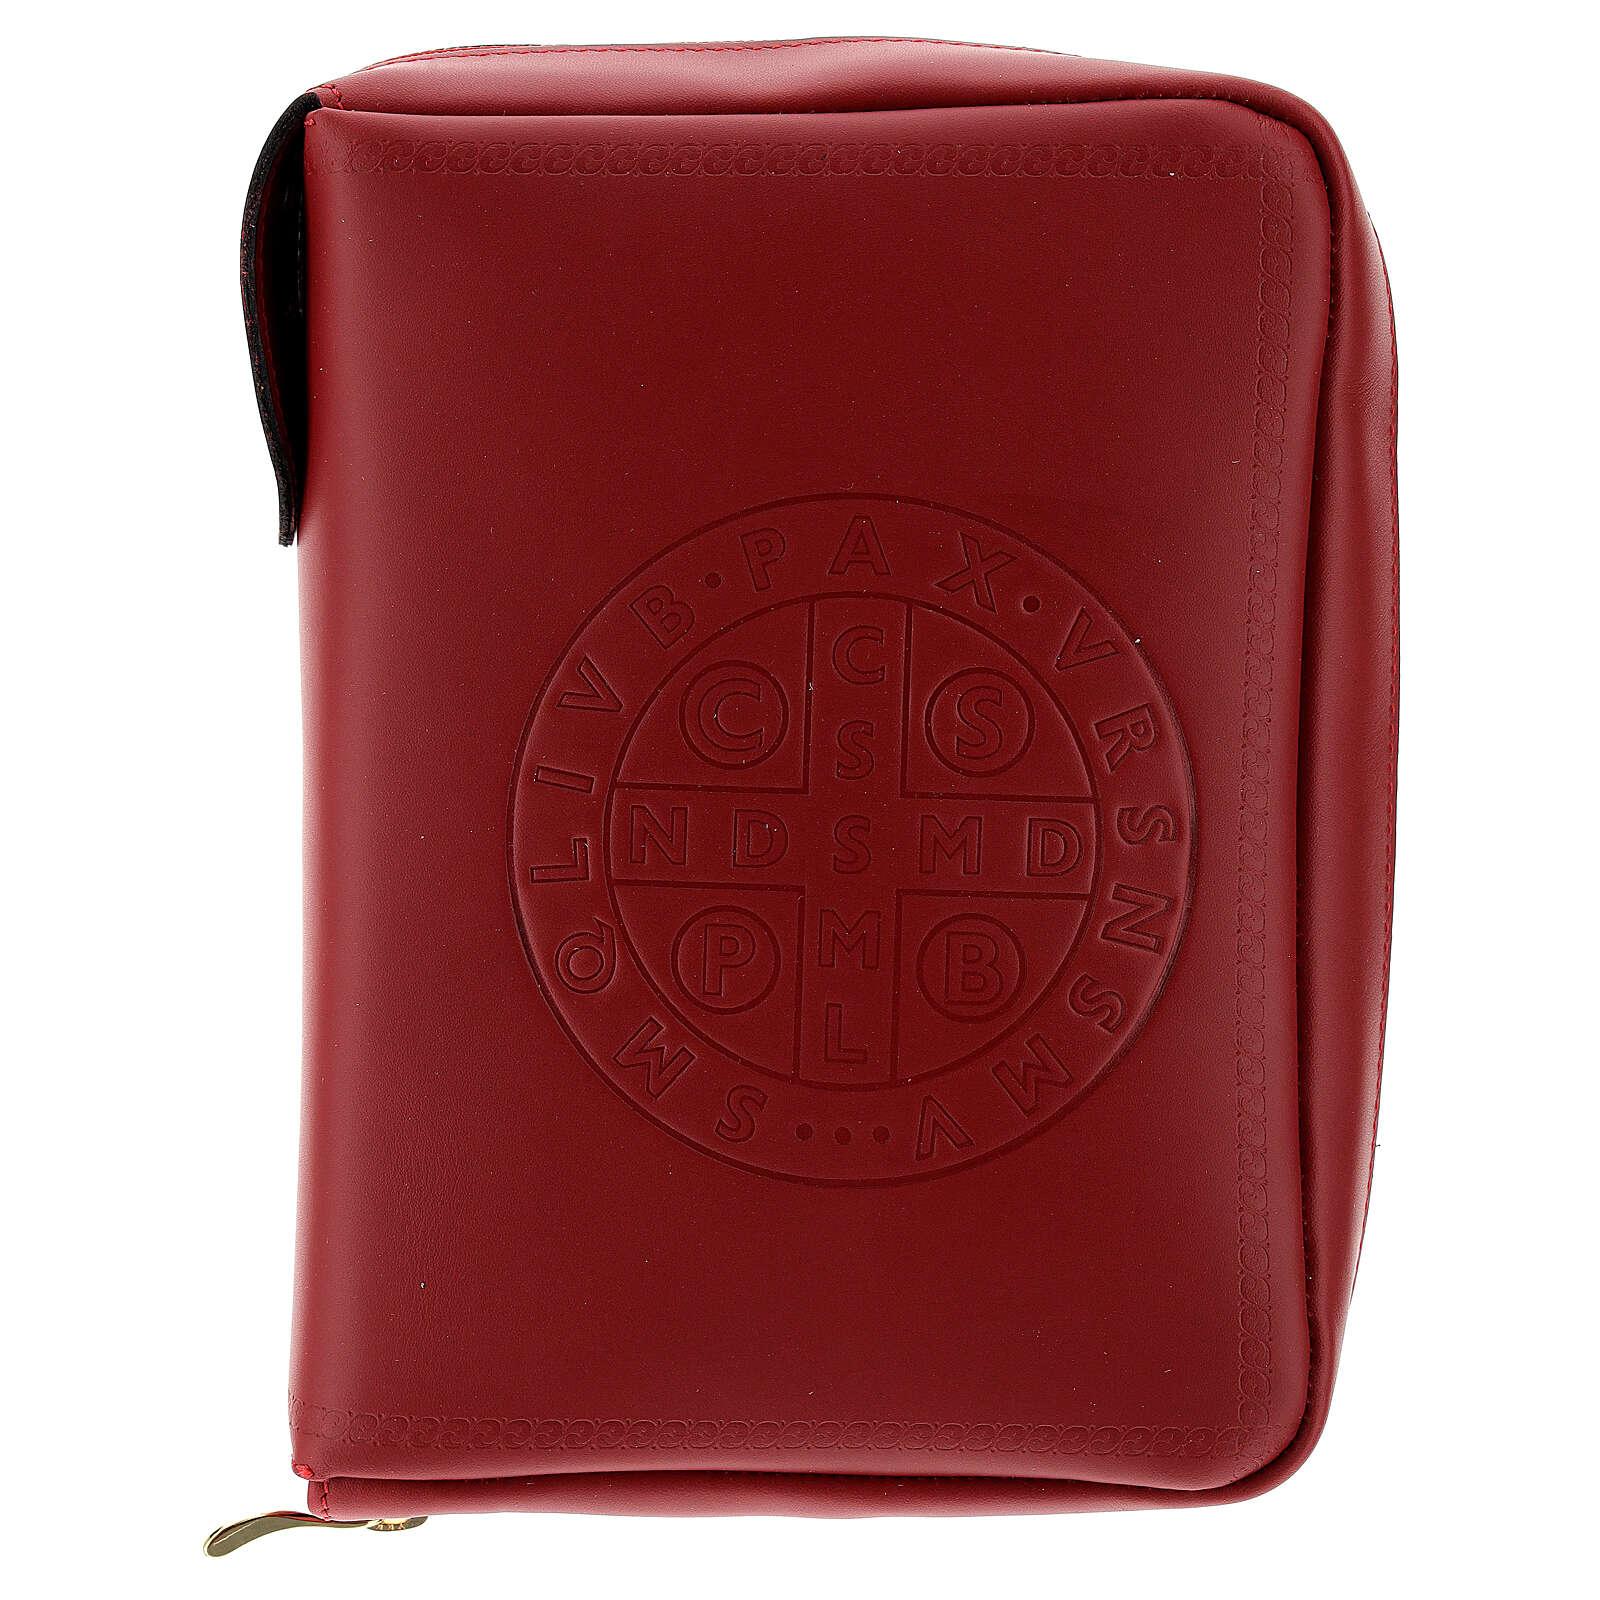 Copertina B. Gerusalemme rossa S. Benedetto zip 4